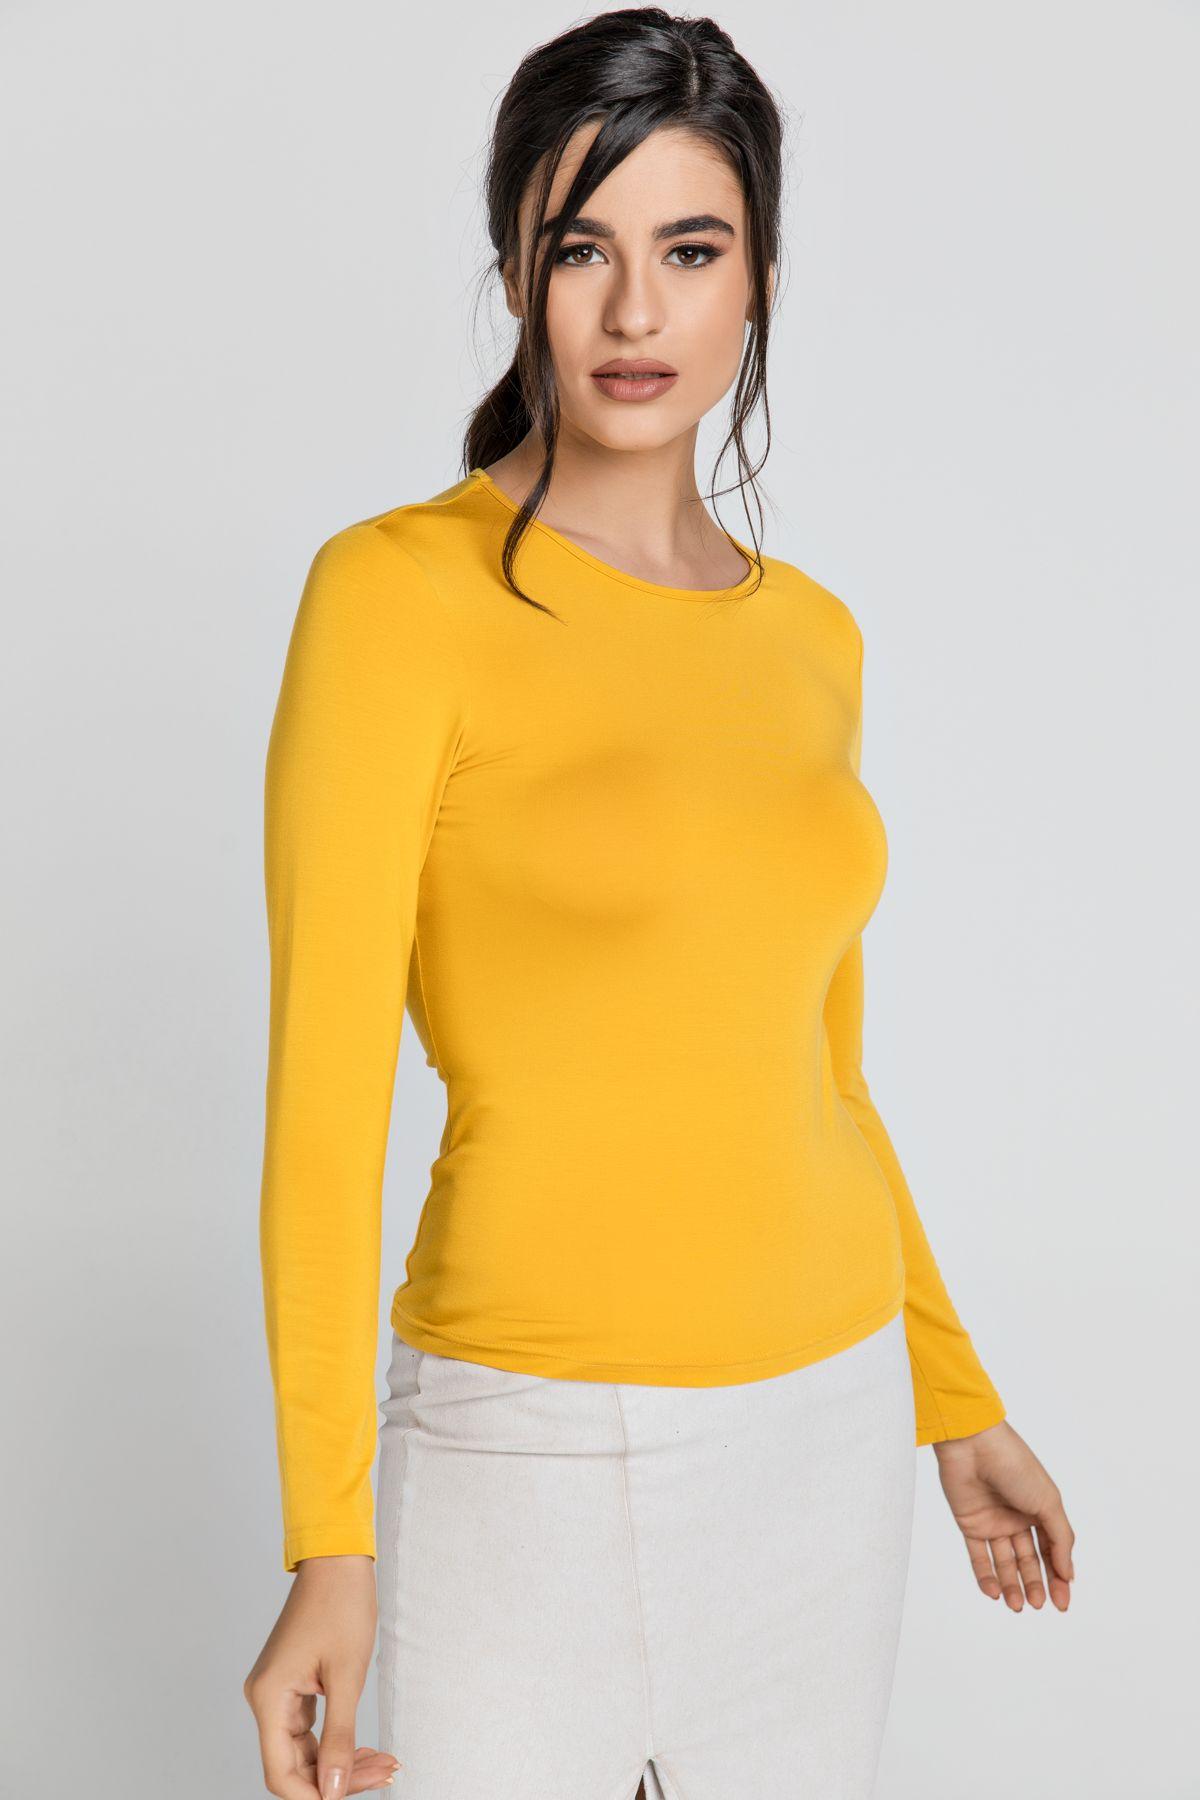 Ceylon Yellow Jersey Top